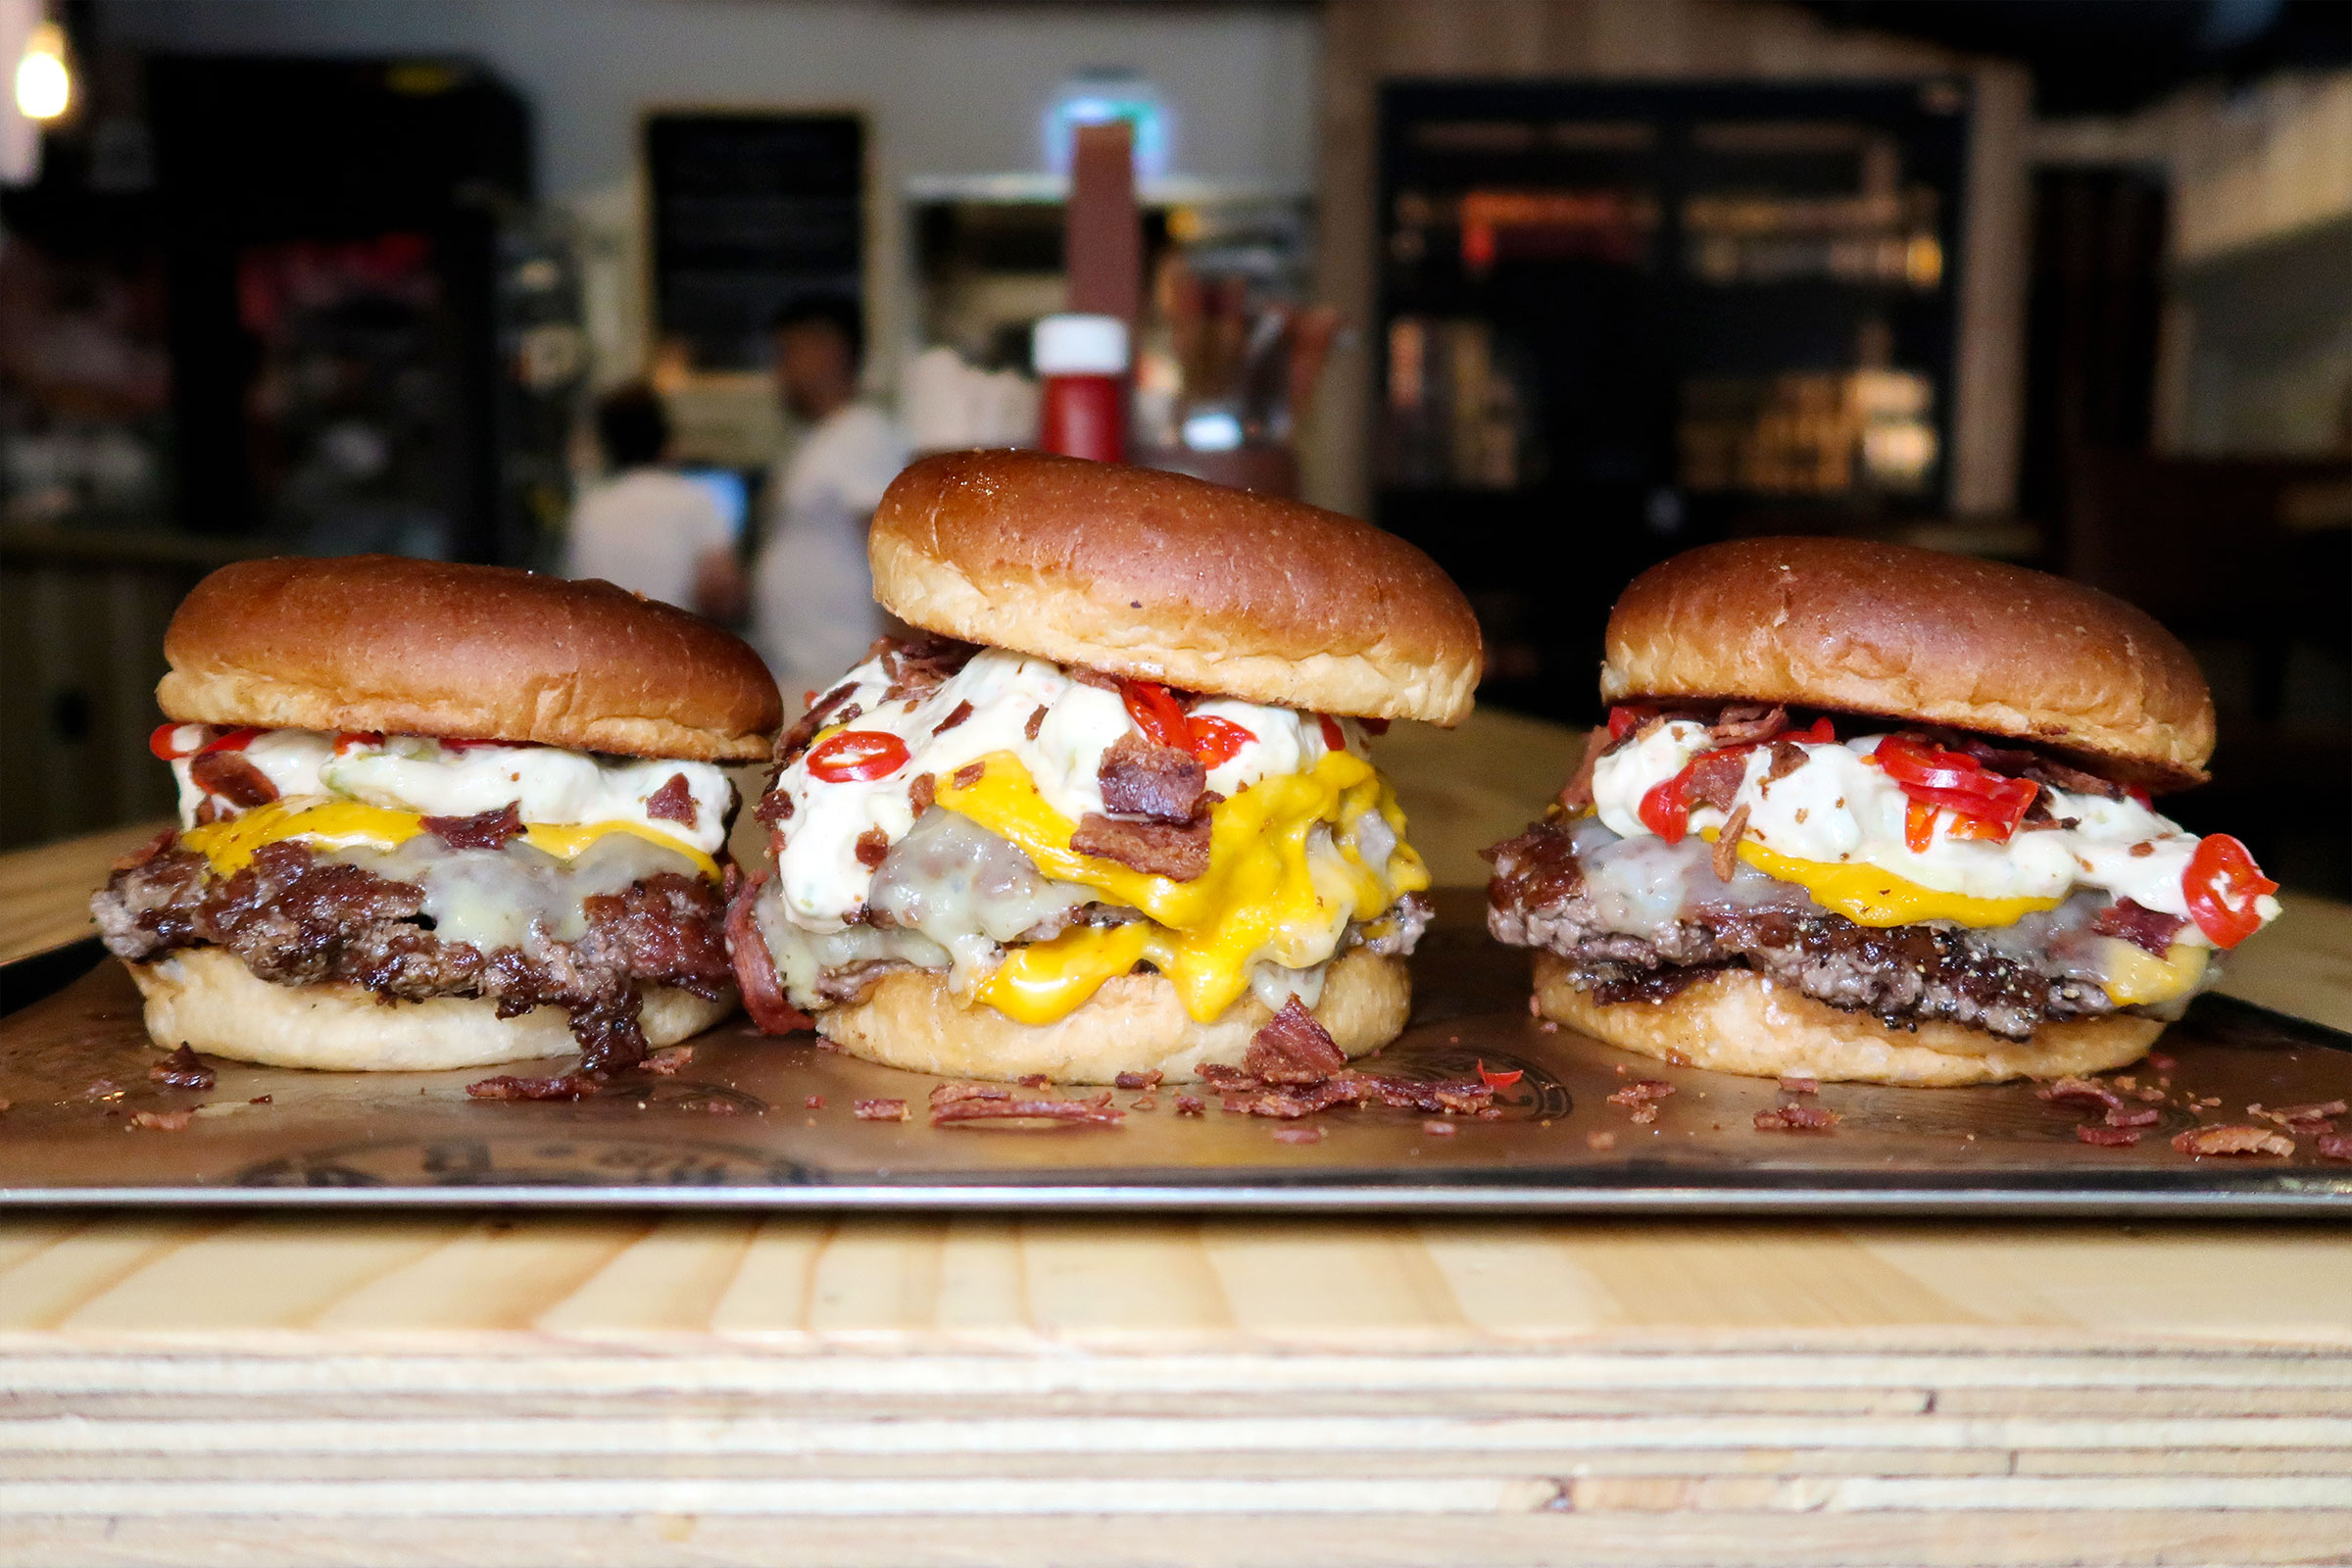 The Burgerdude 2.0 kommer till Stockholm Beer Fest